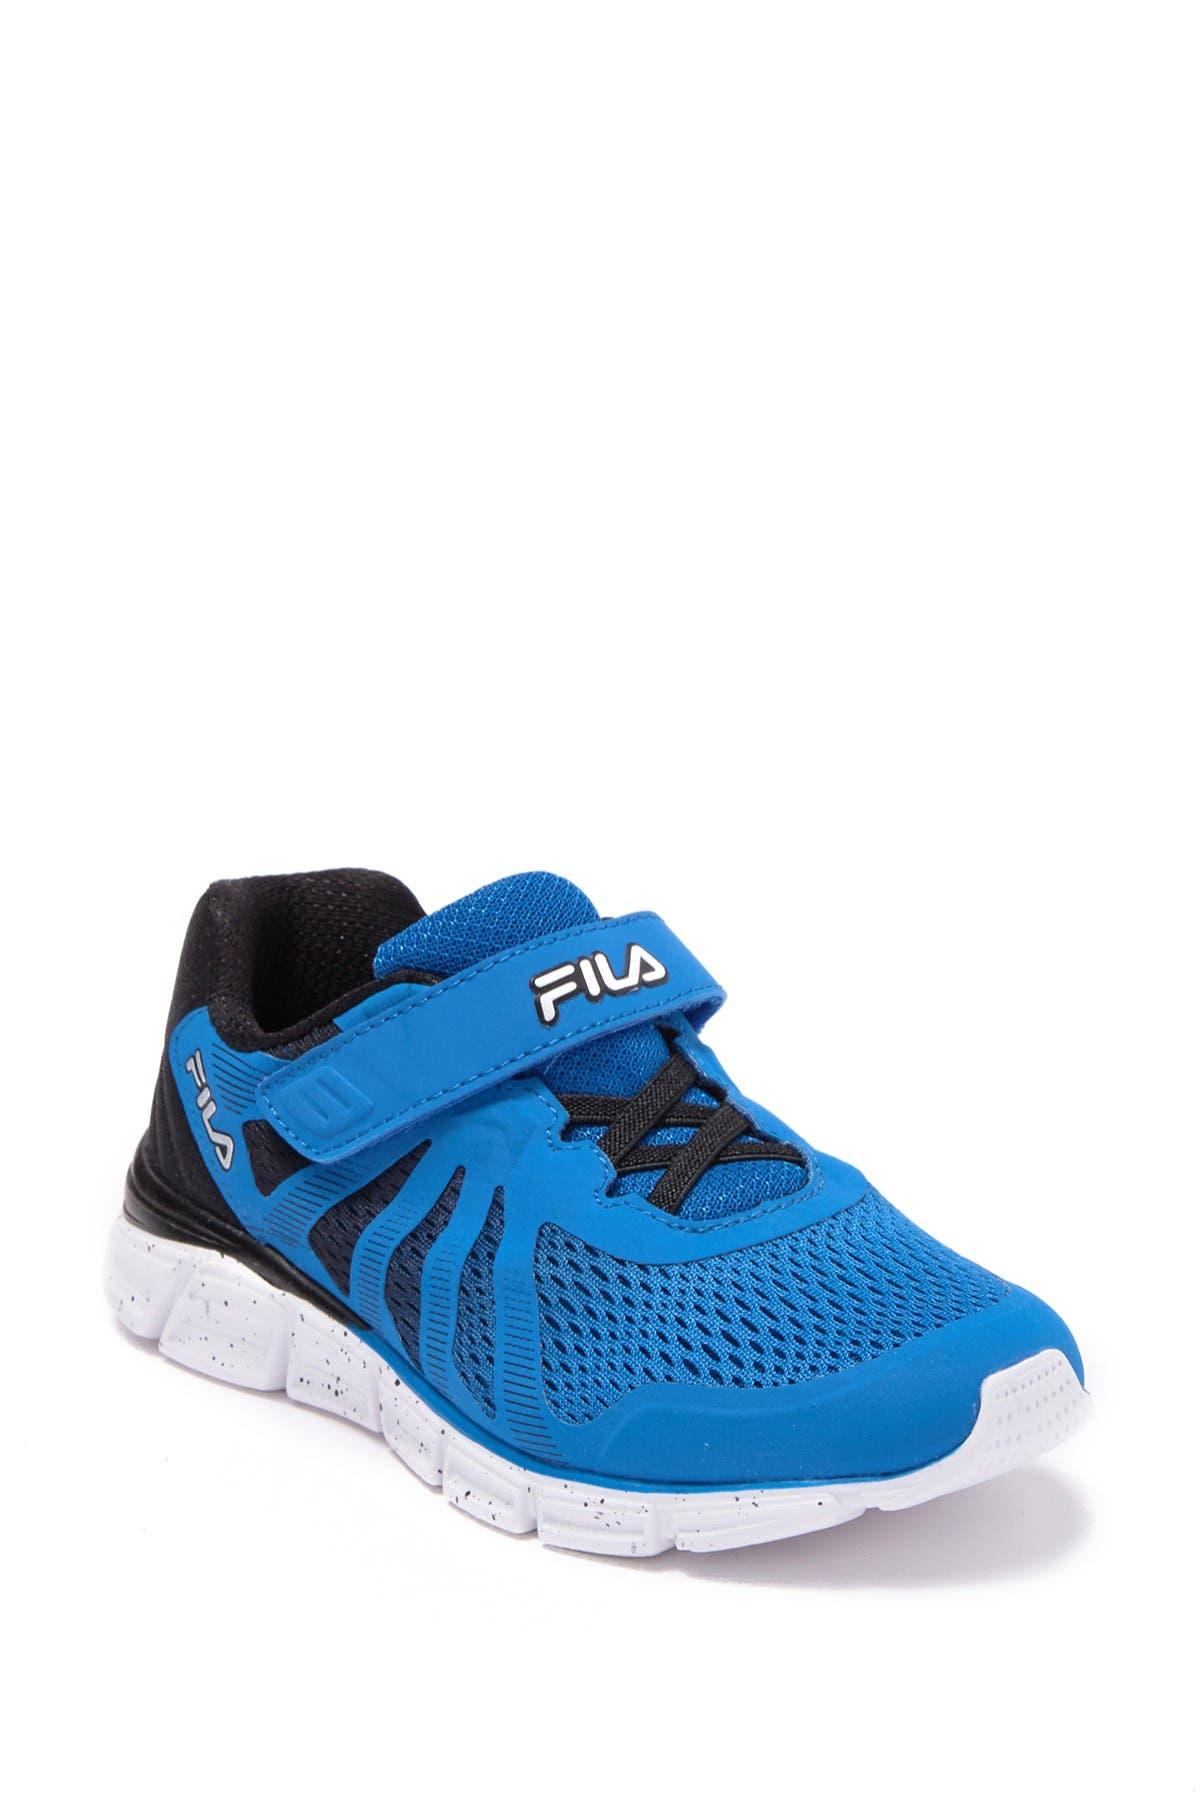 FILA USA   Fraction 2 Strap Sneaker